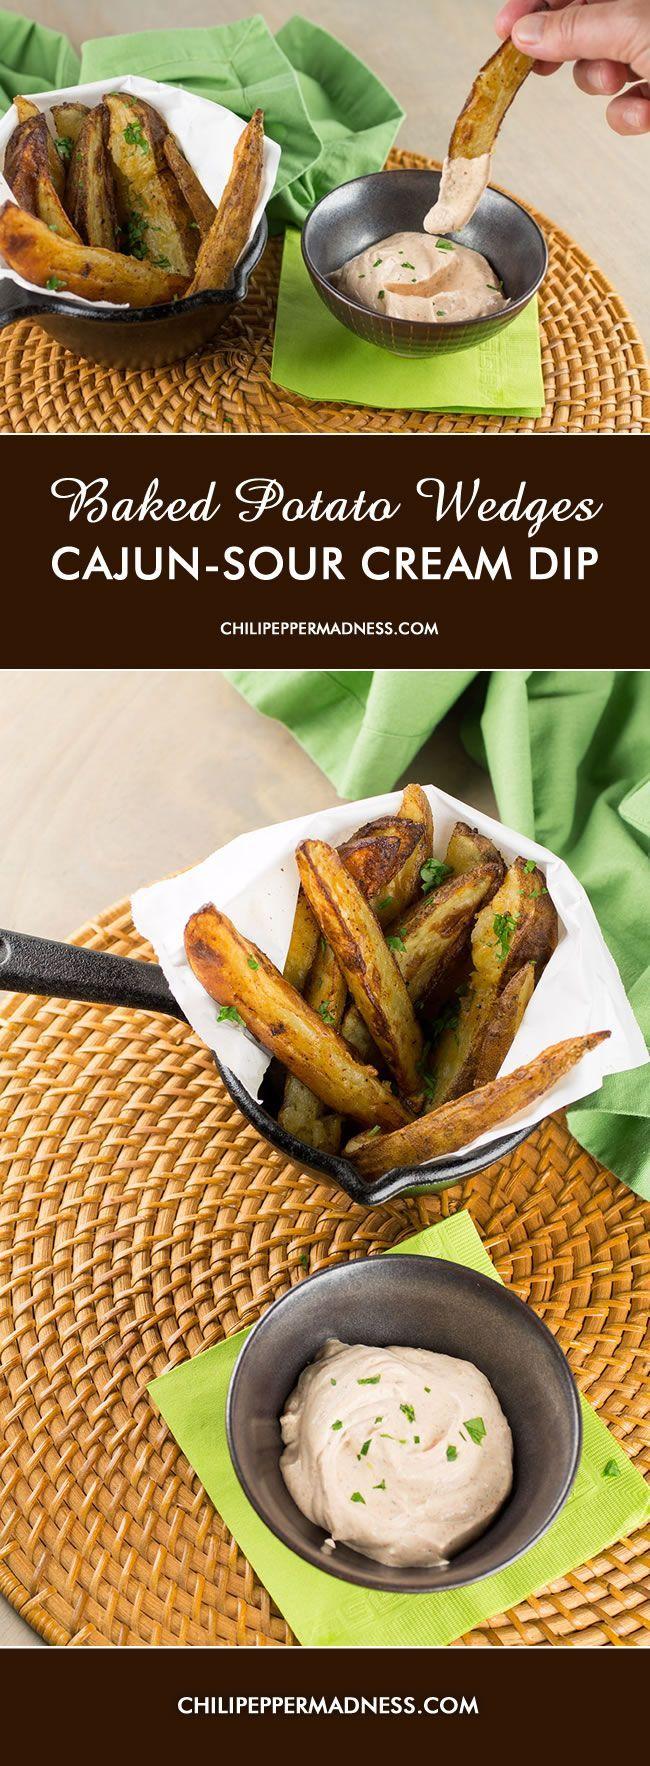 Baked Potato Wedges With Cajun Sour Cream Sauce Spicy Recipes Sour Cream Sauce Appetizer Recipes